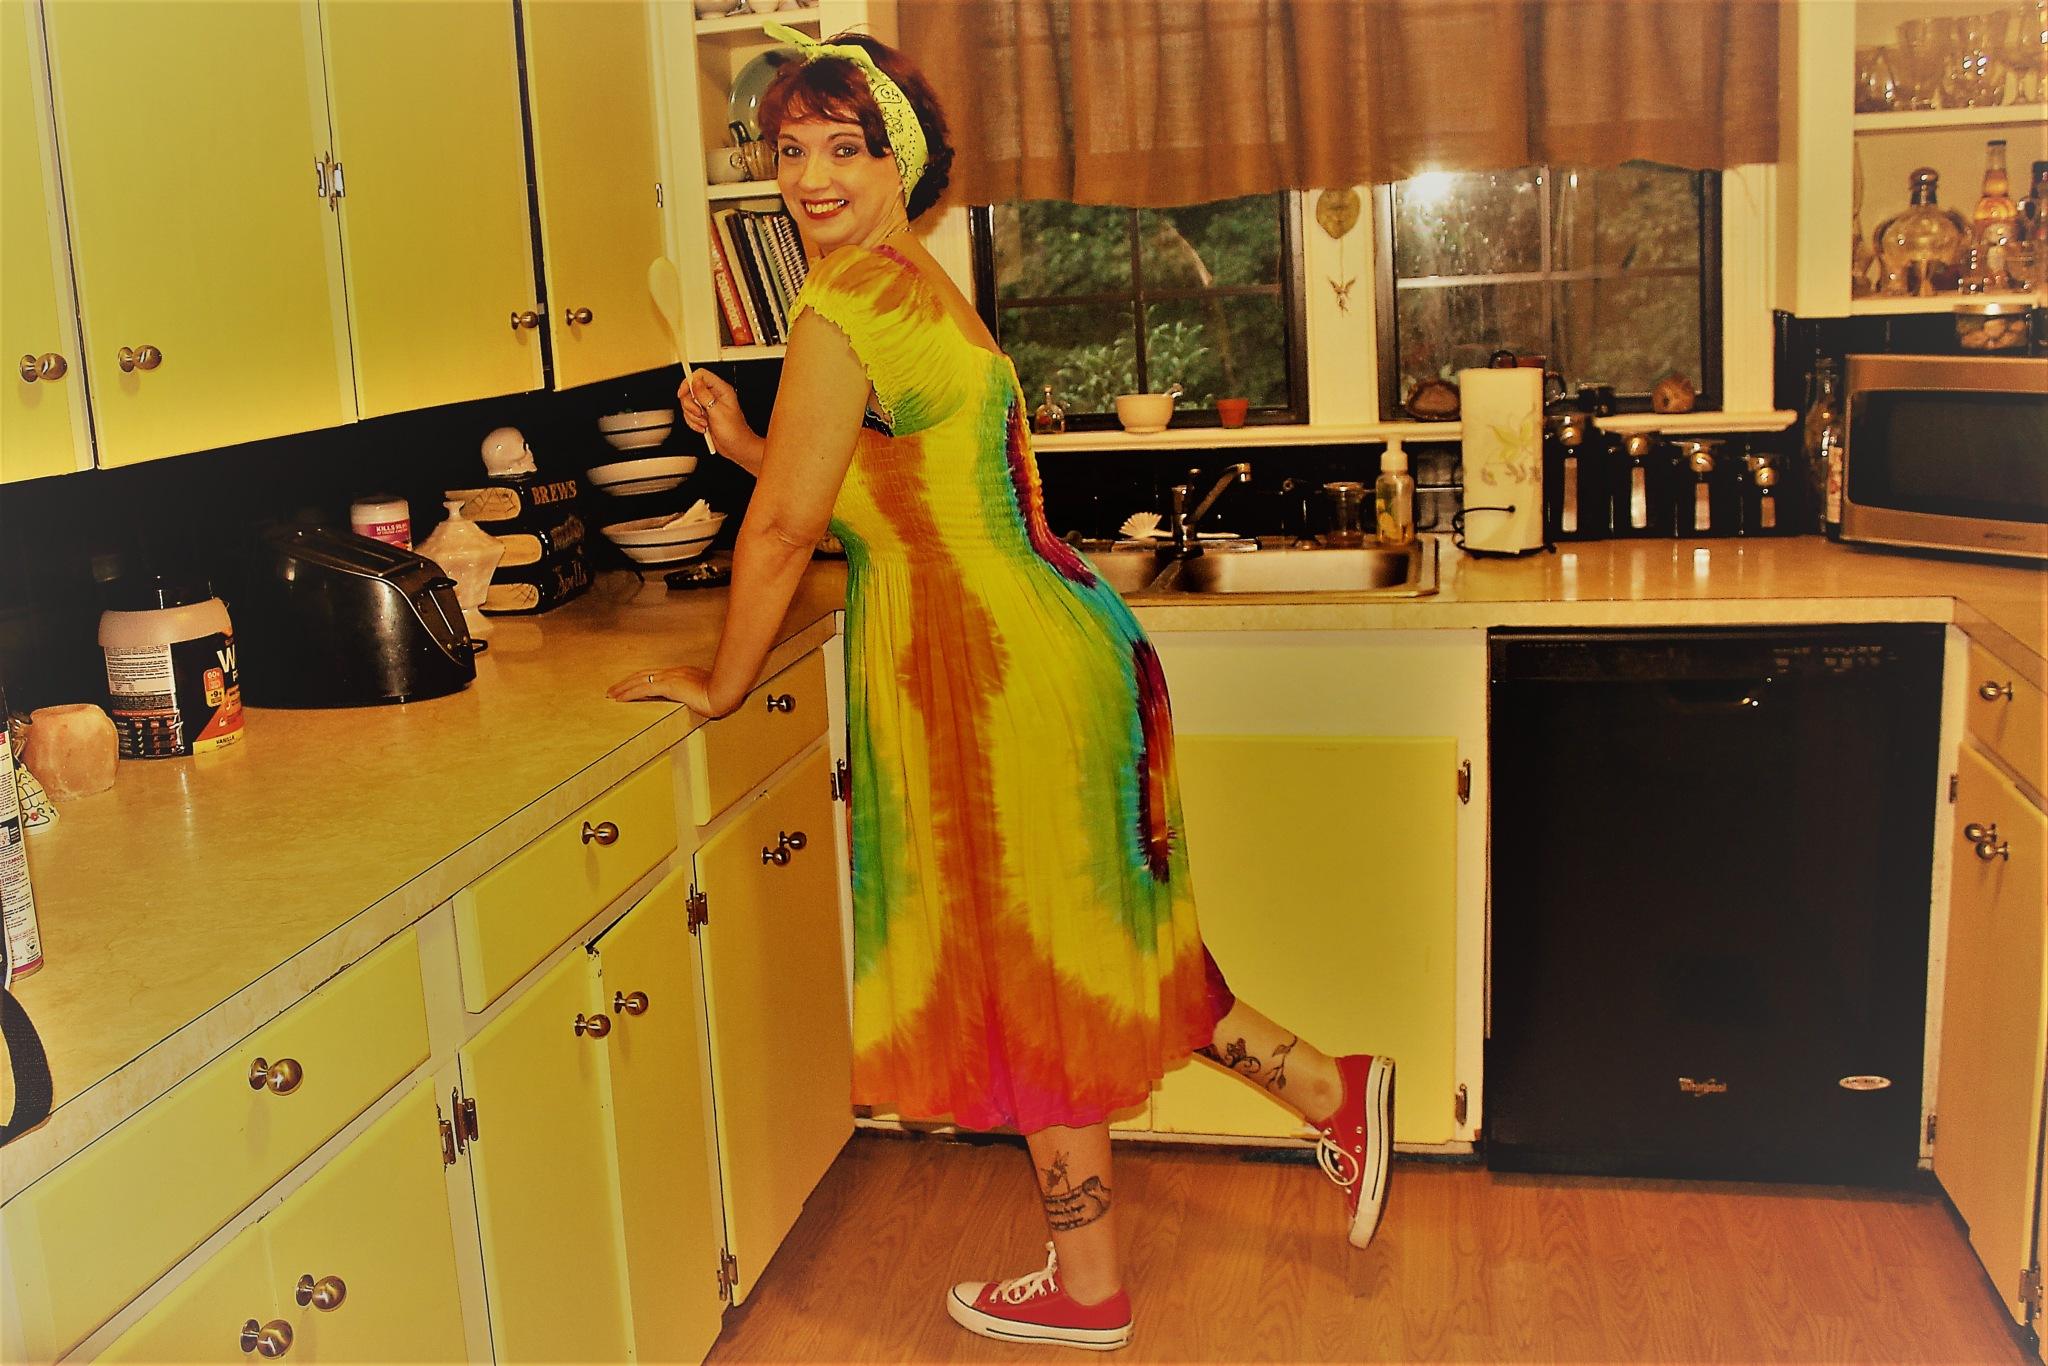 homemaker by craig.turner.756